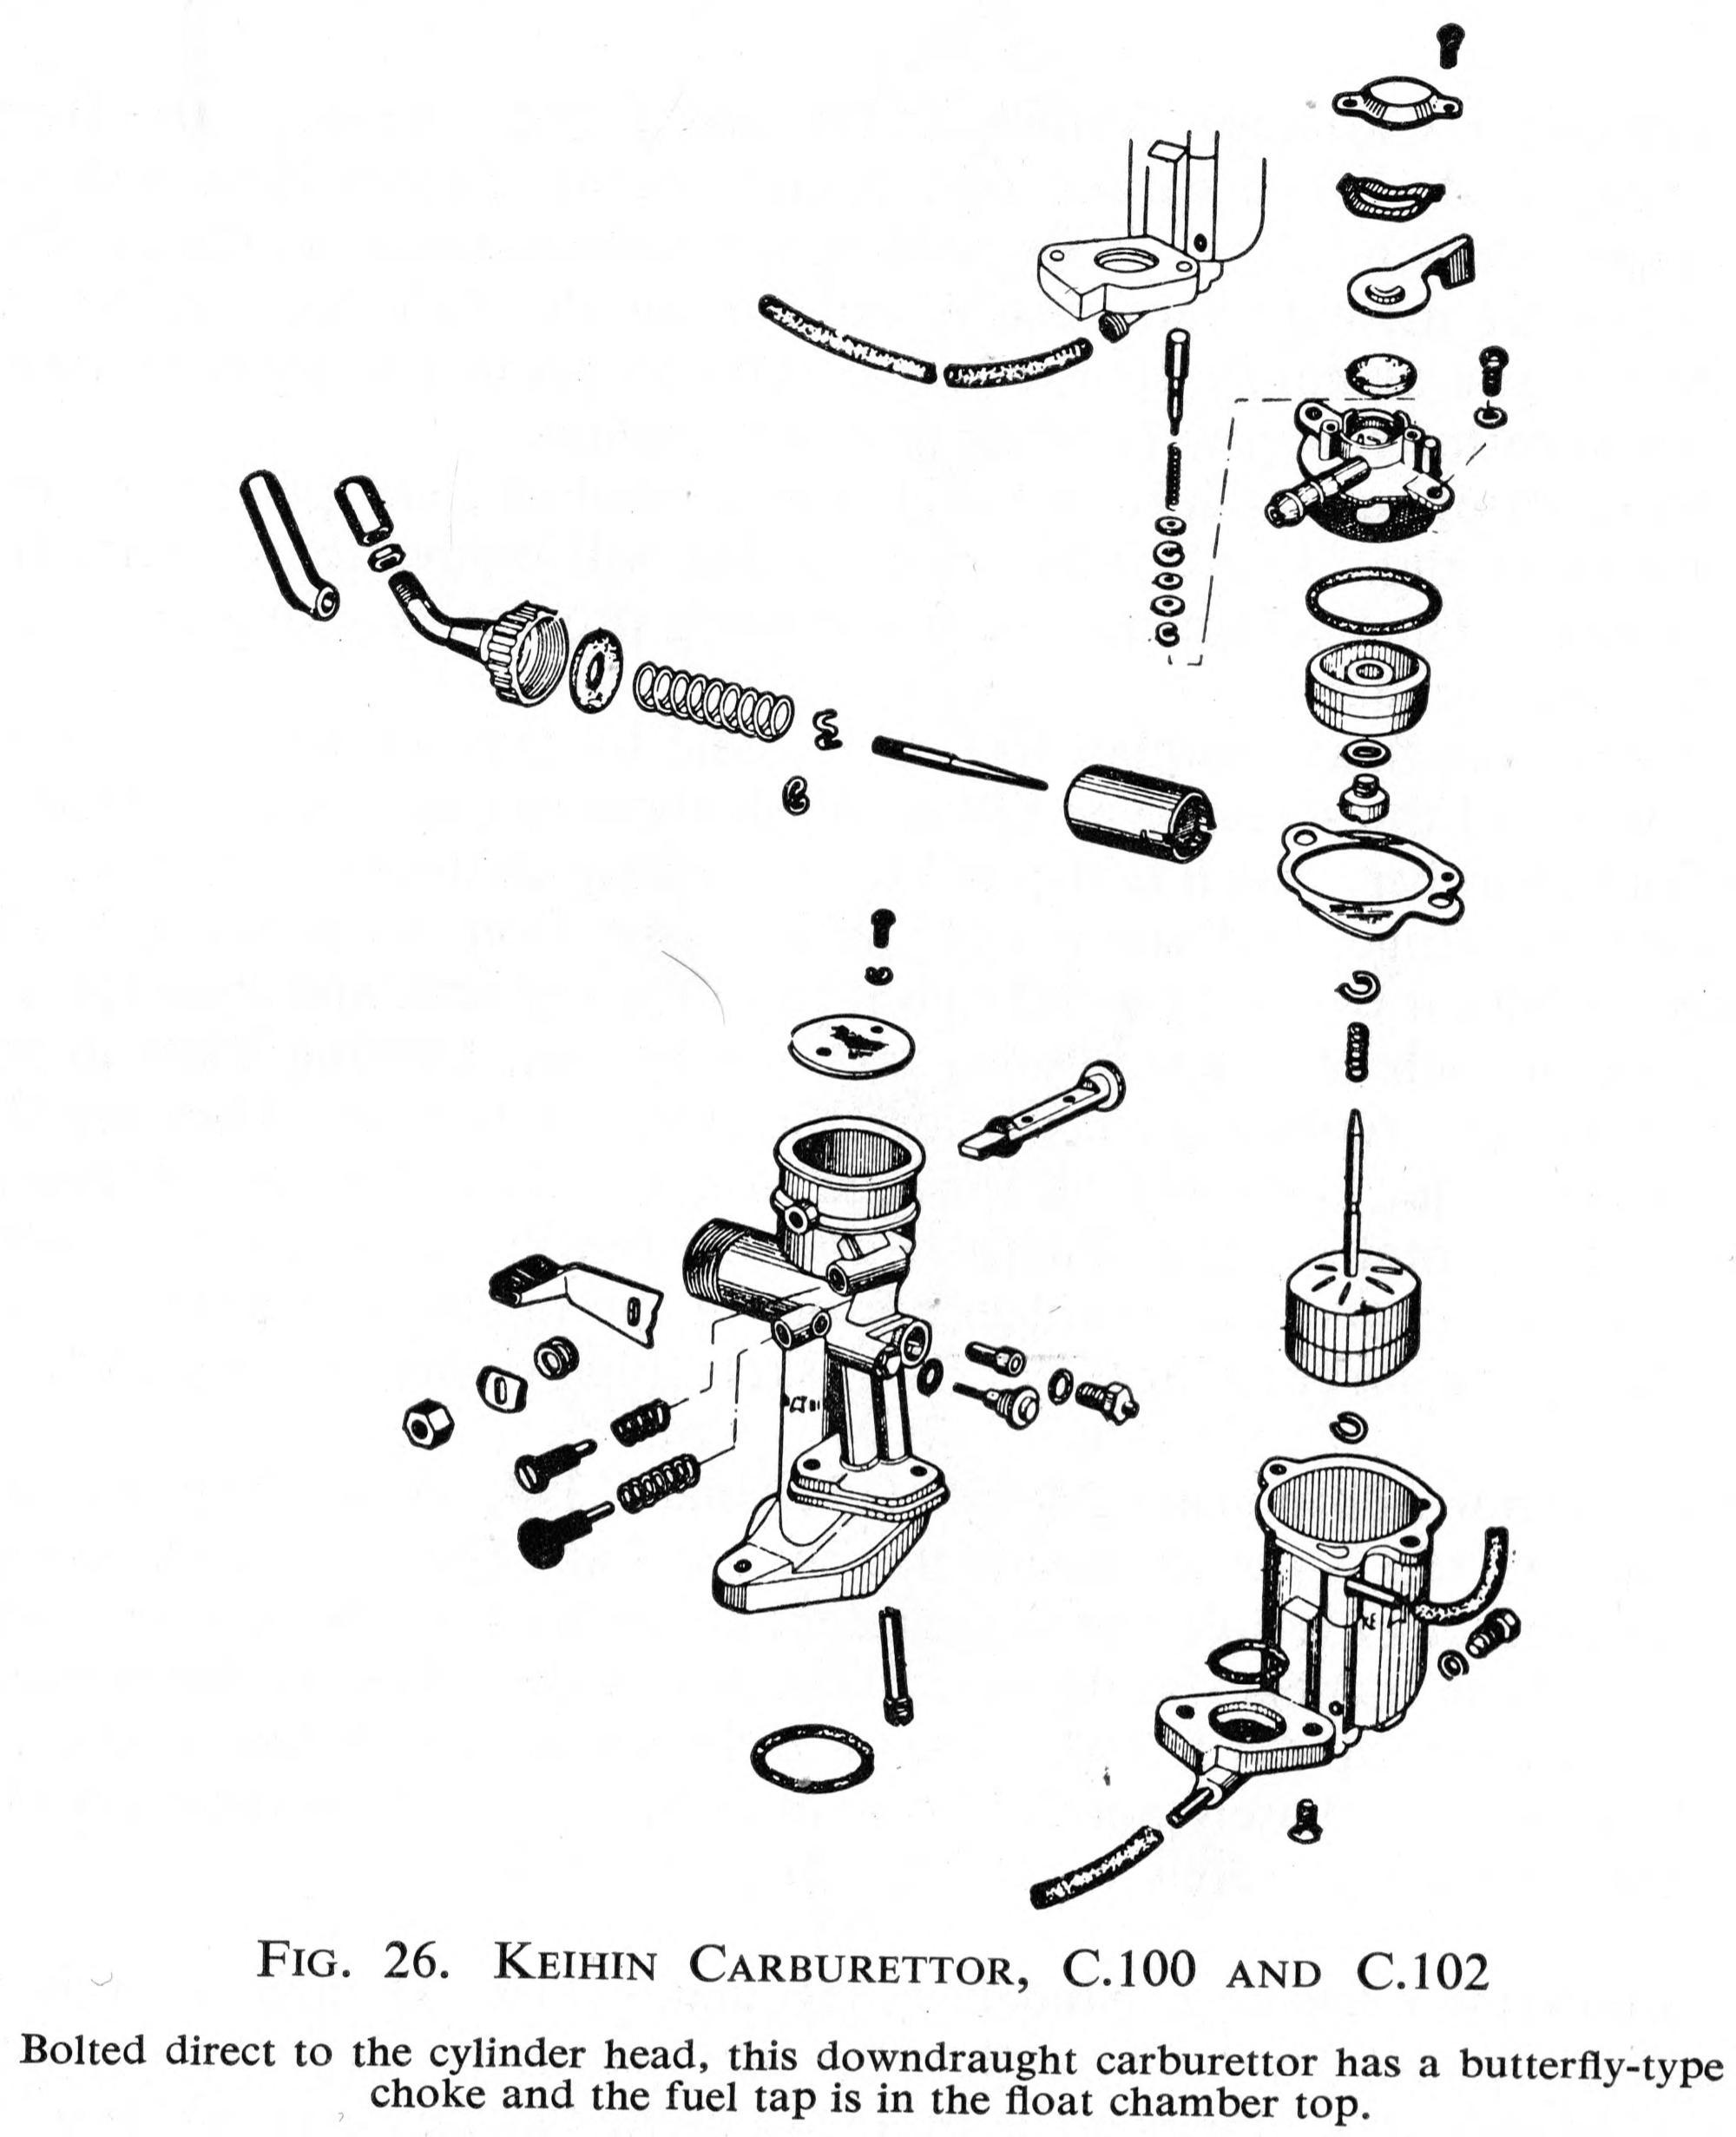 hight resolution of boh keihin carburettor honda c100